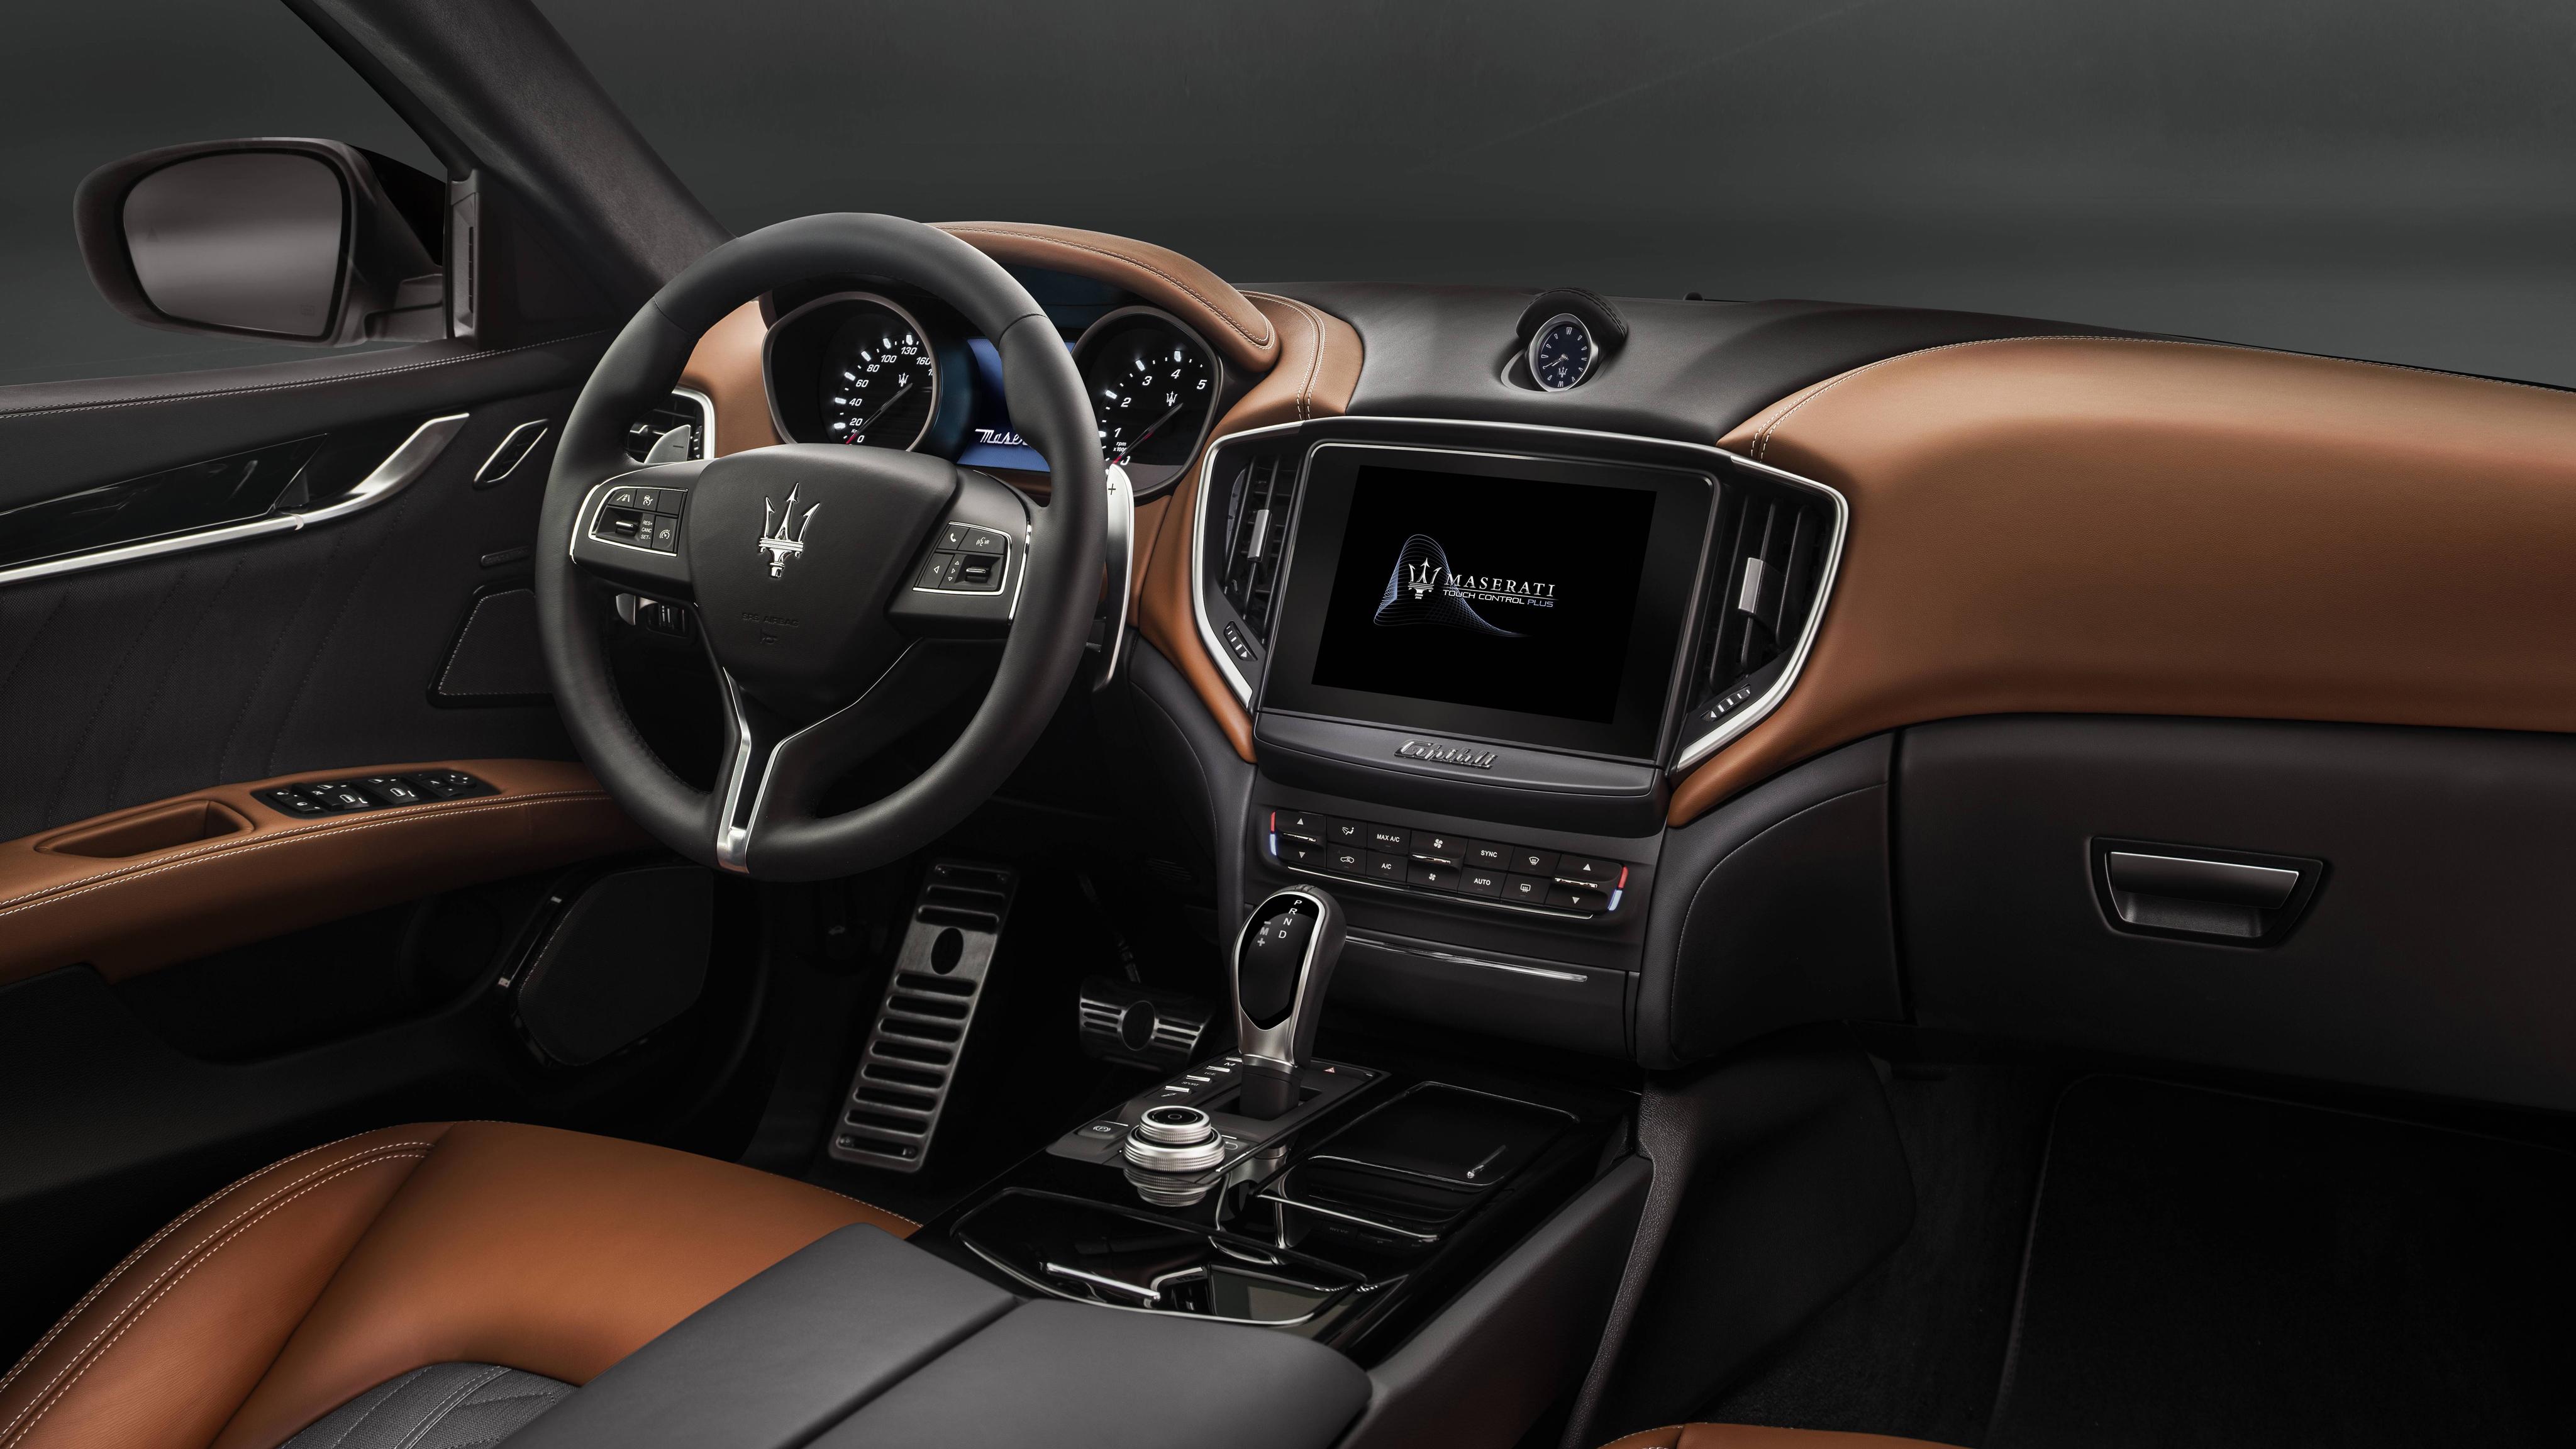 2018 Maserati Ghibli GranLusso Interior Wallpaper | HD Car ...